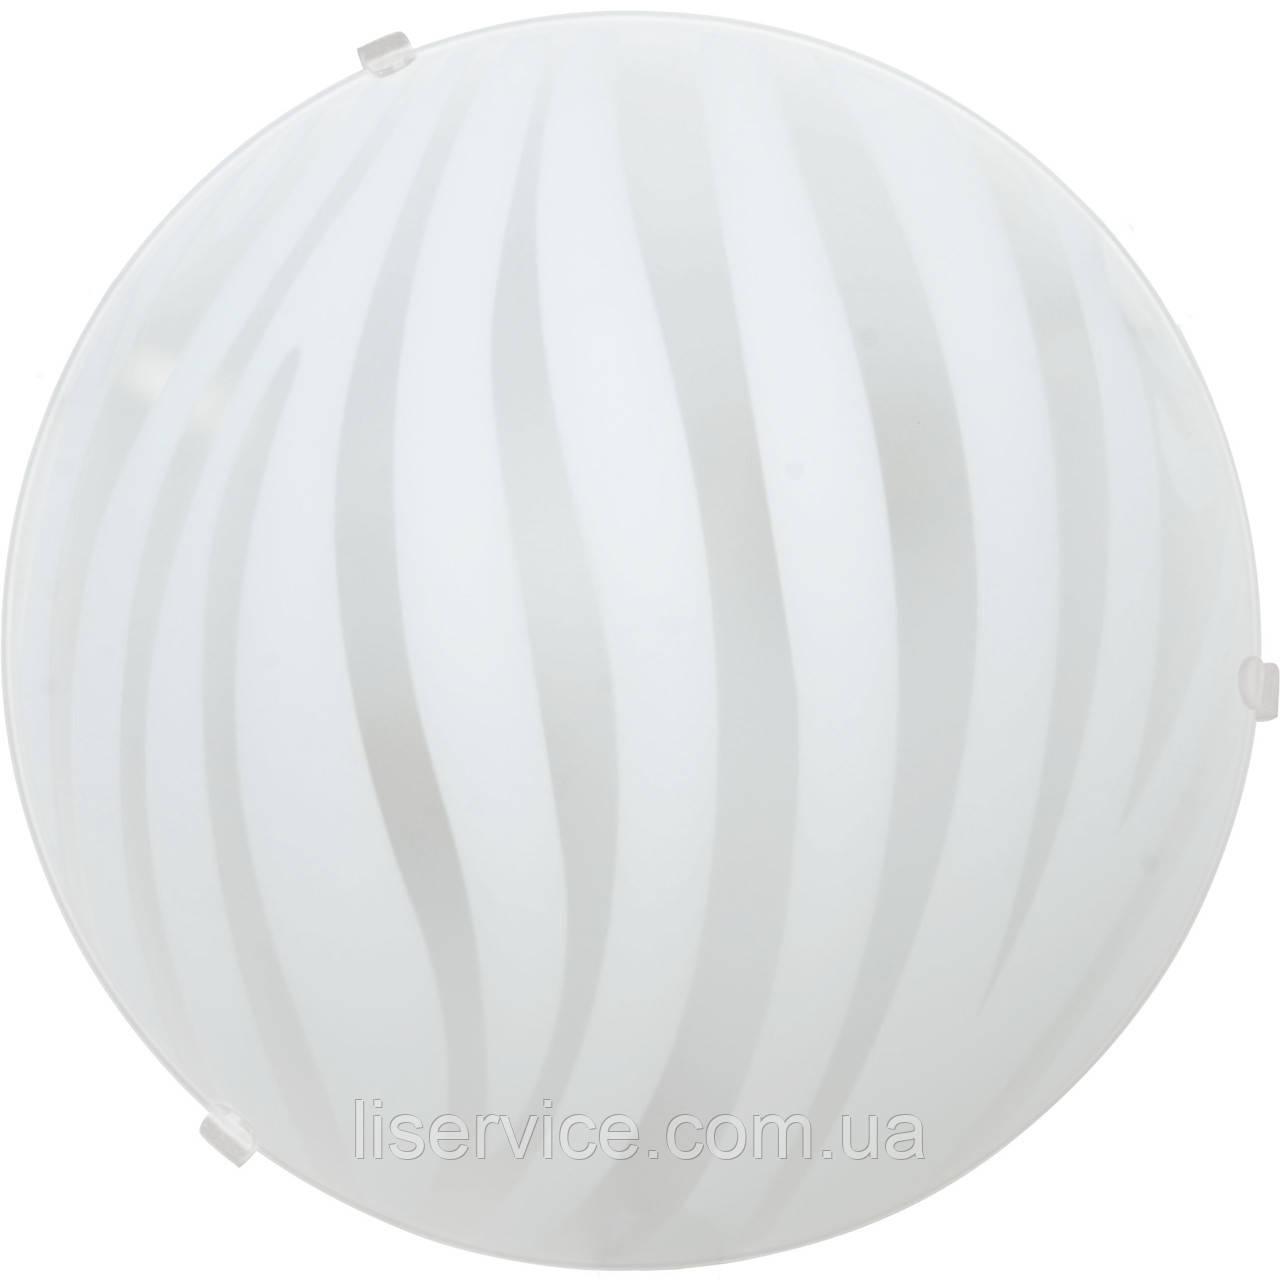 10060 Зебра НББ 1х100 Вт,Е27 d=250, белый